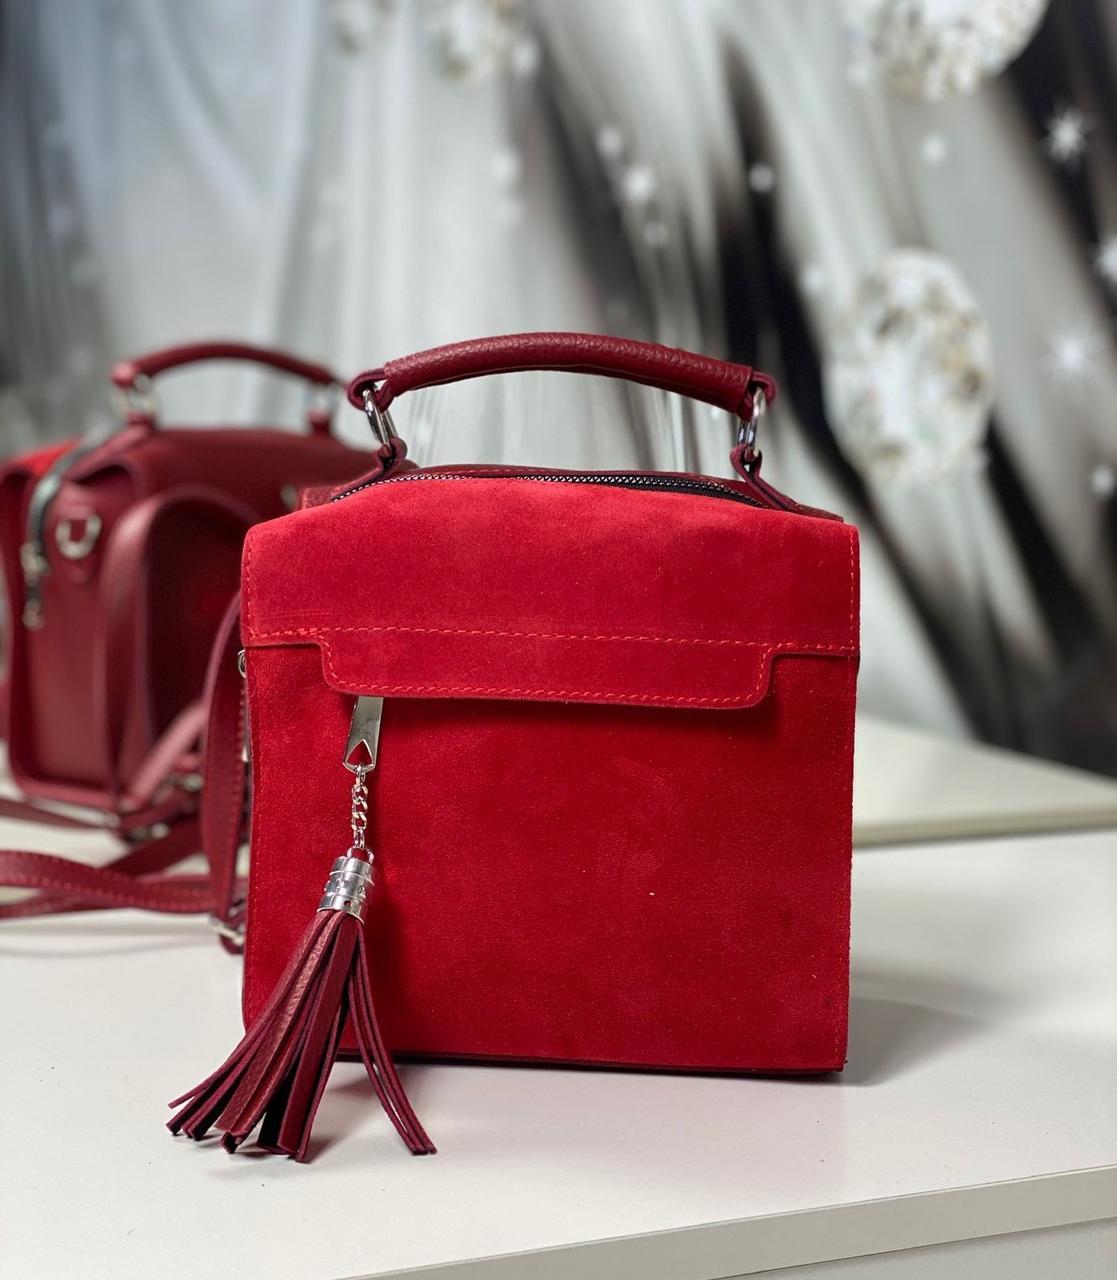 Маленькая женская сумочка-рюкзак молодежная городская клатч красная натуральная замша+кожзам